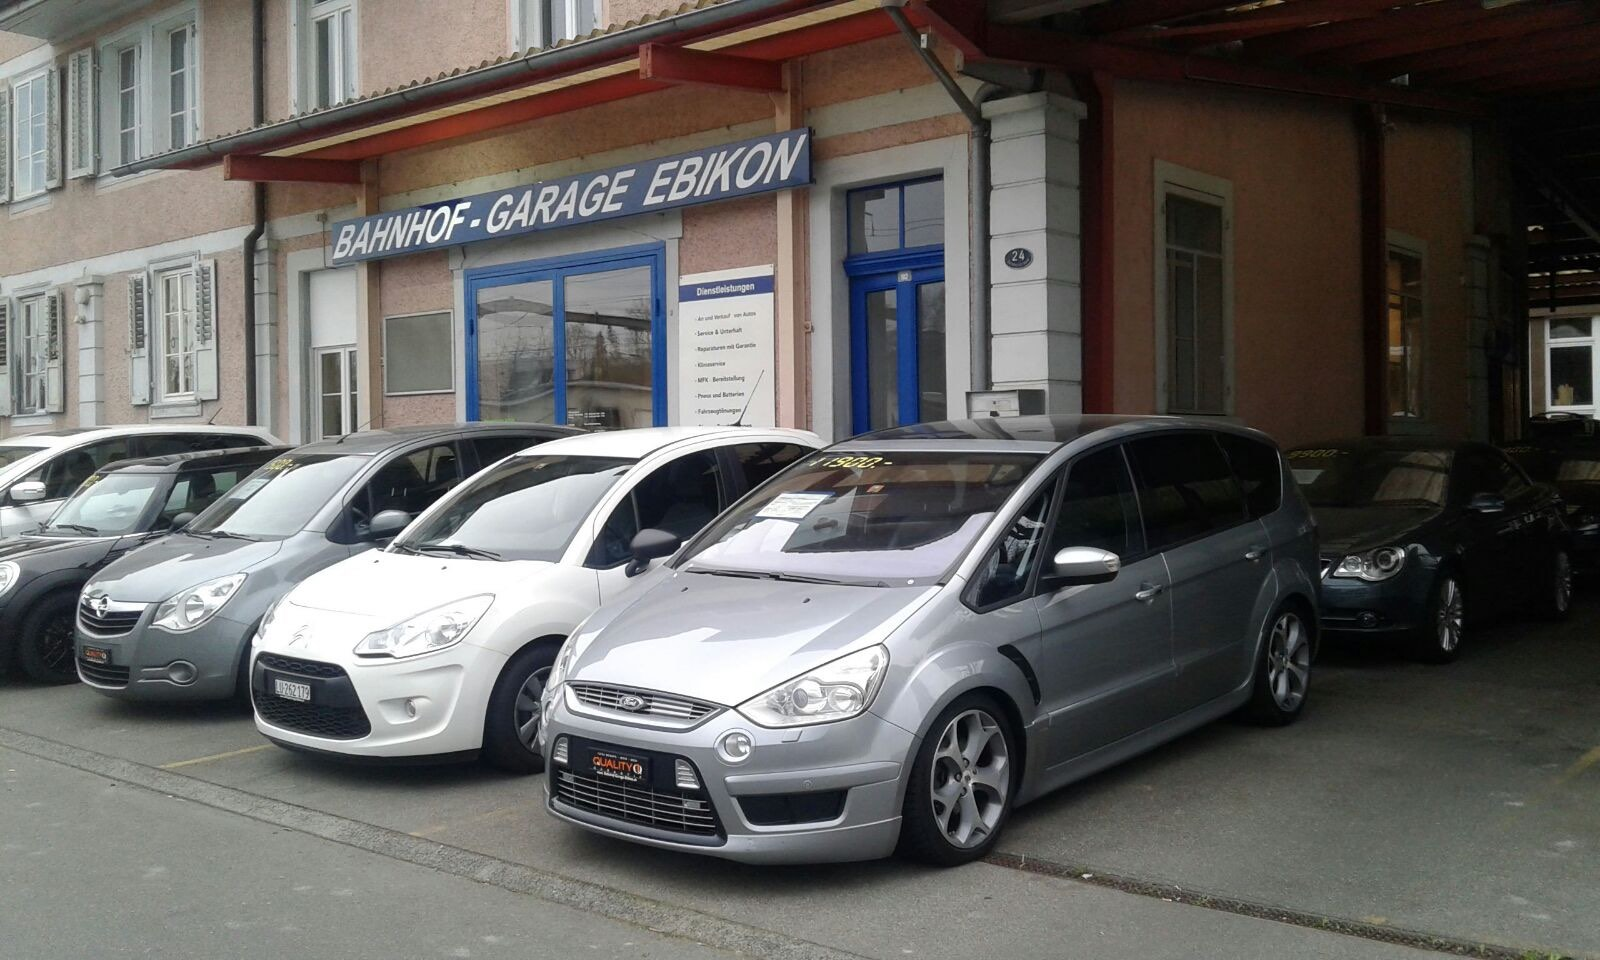 bahnhof-garage-ebikon